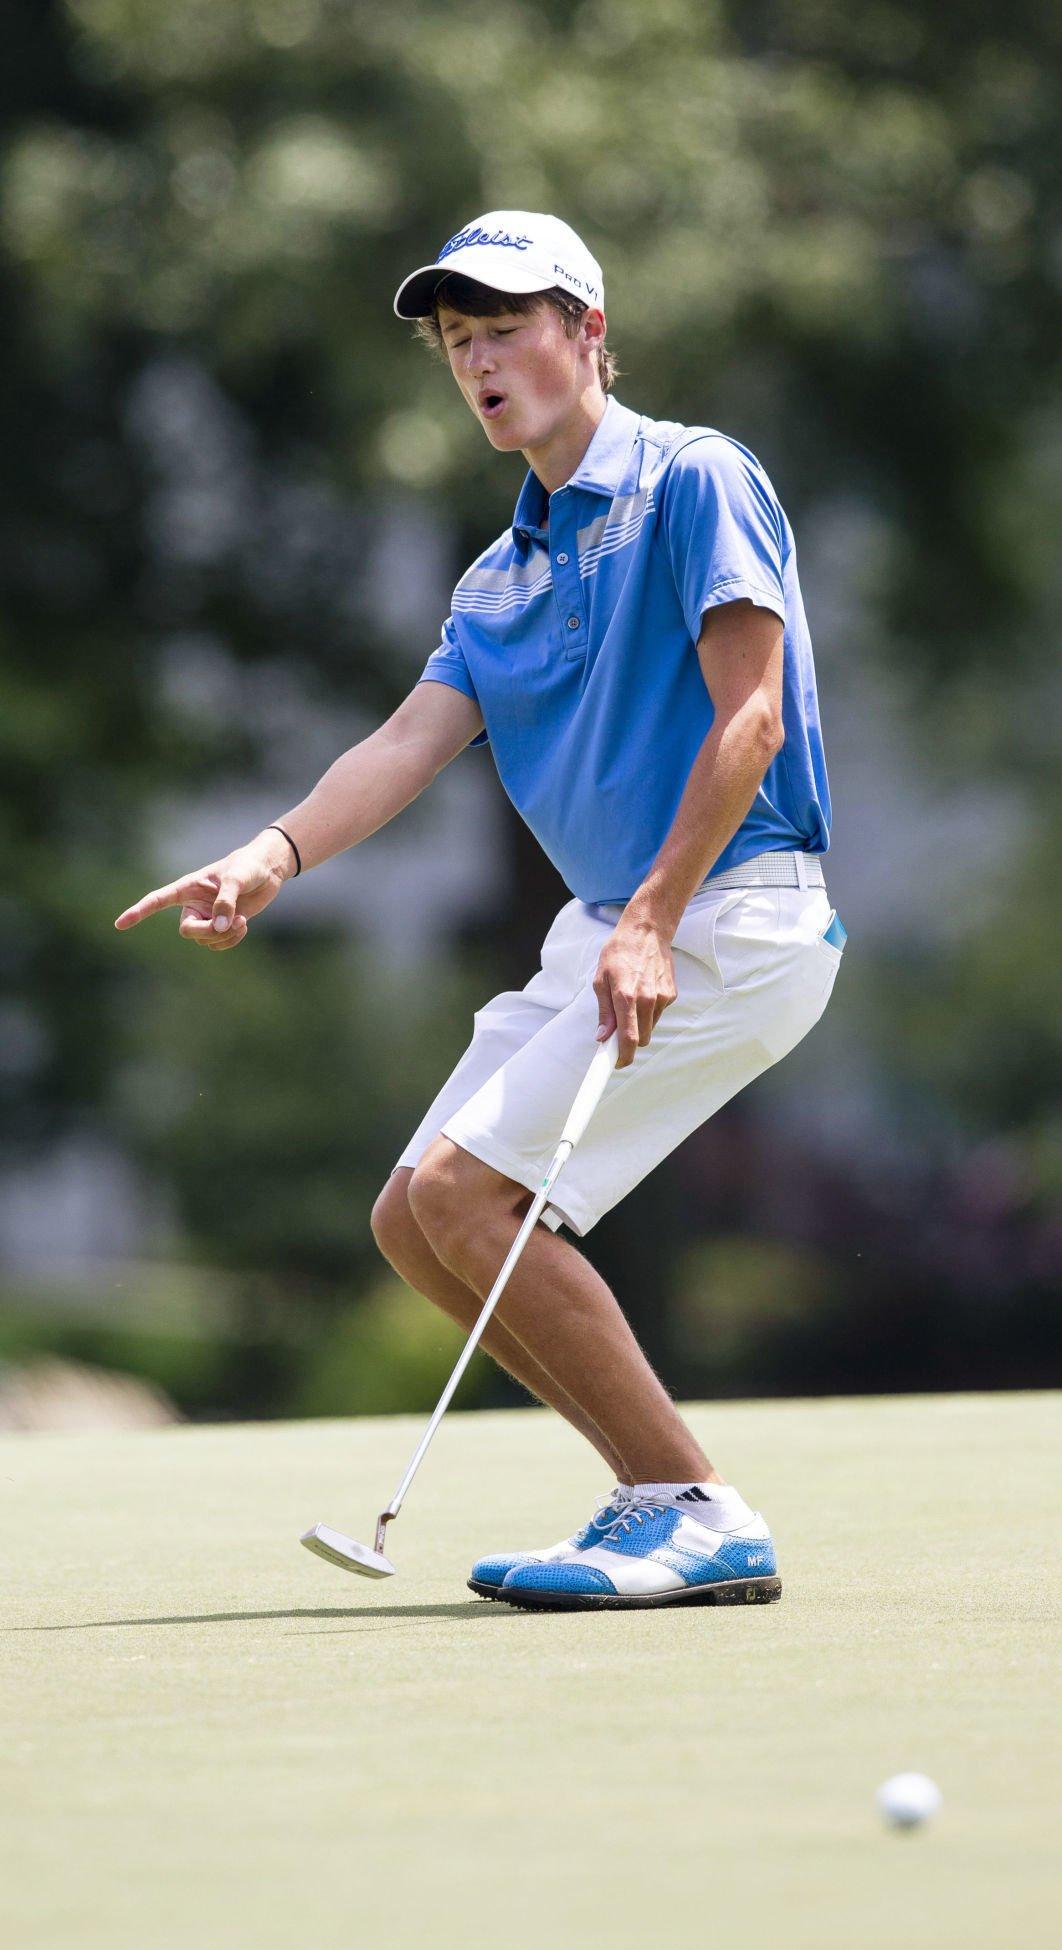 American Junior Golf Association at Sedgefeld